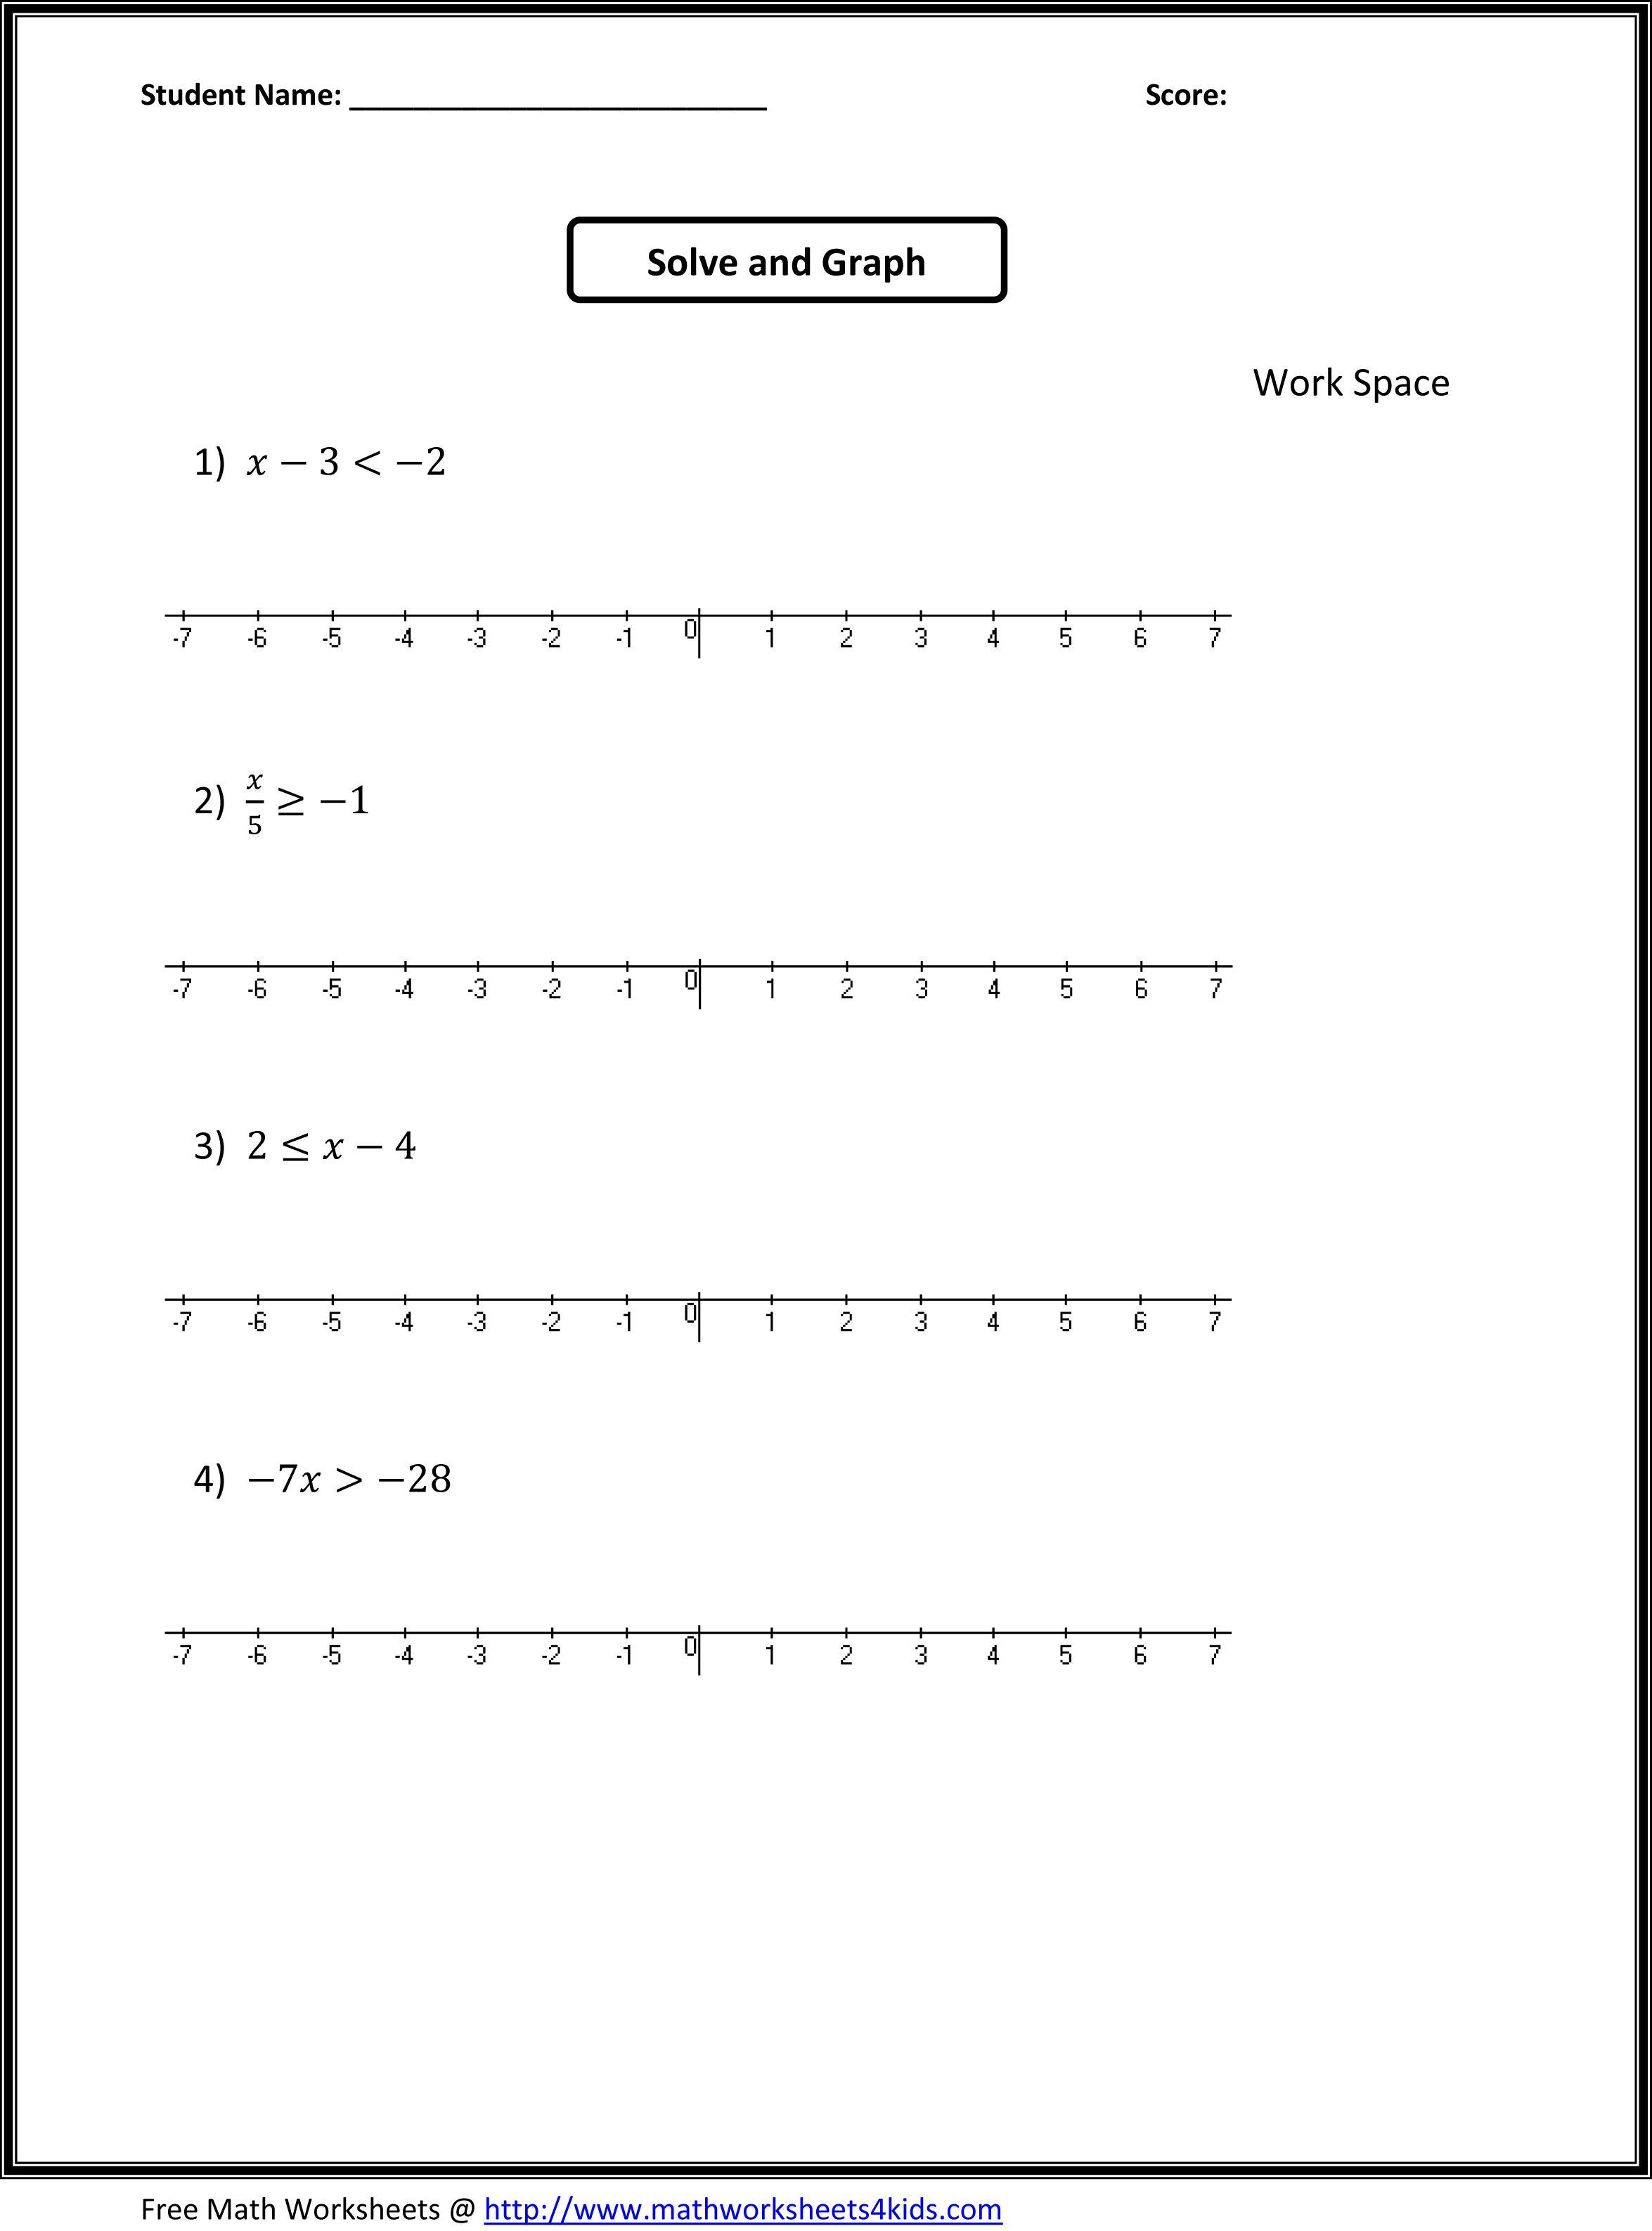 7th Grade Math Worksheets   7th grade math worksheets [ 3174 x 2350 Pixel ]